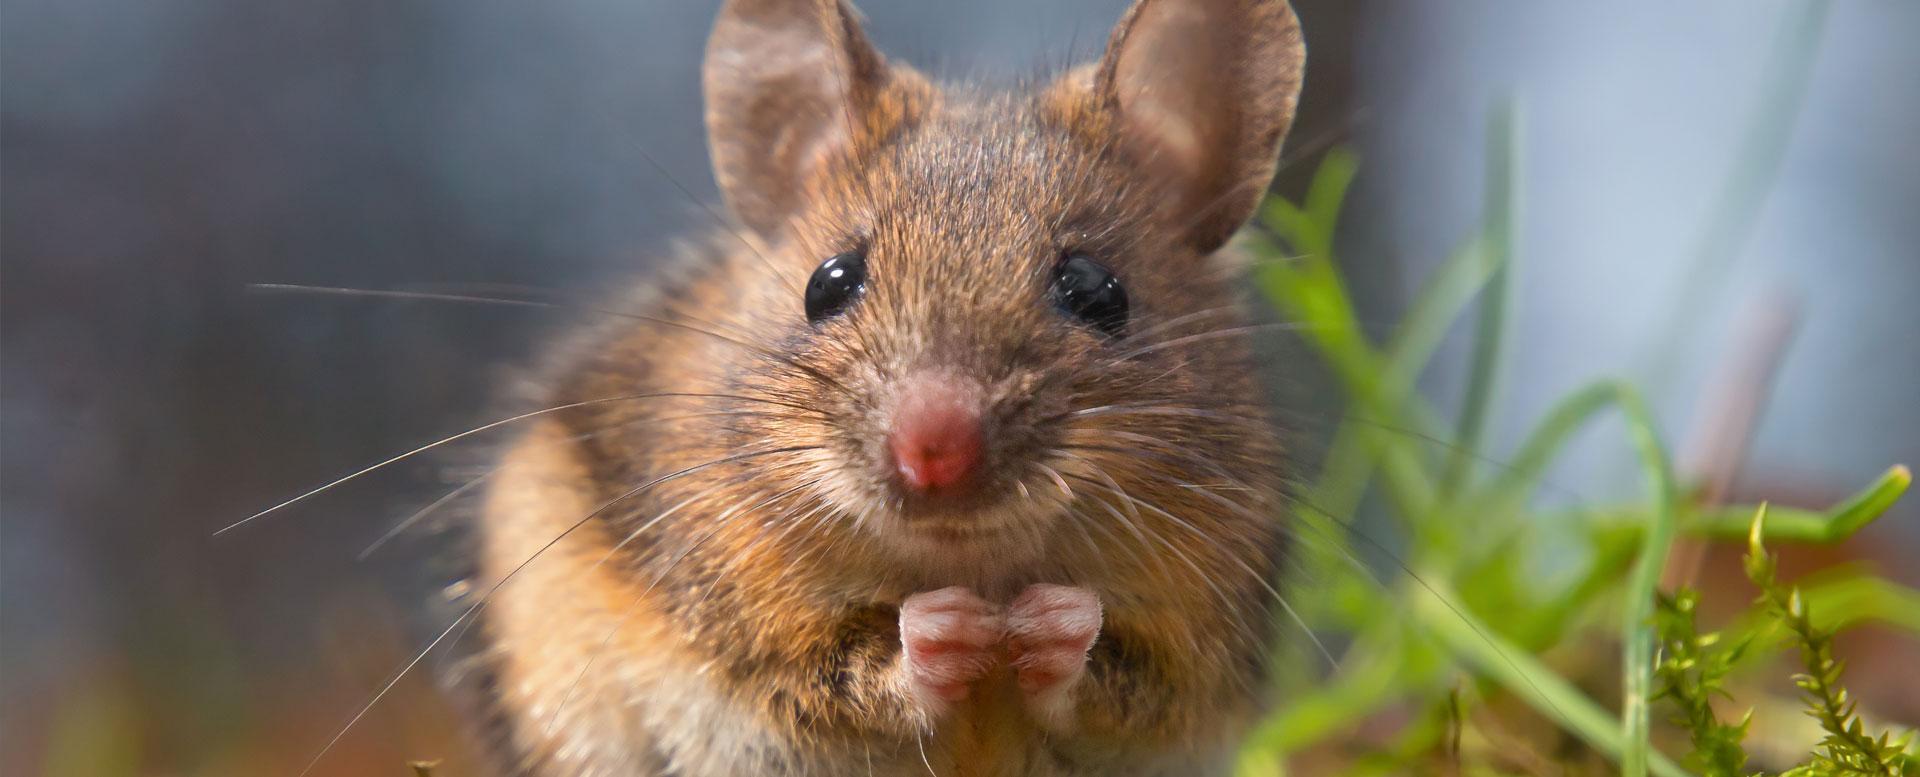 Mäuse Im Haus Tricks